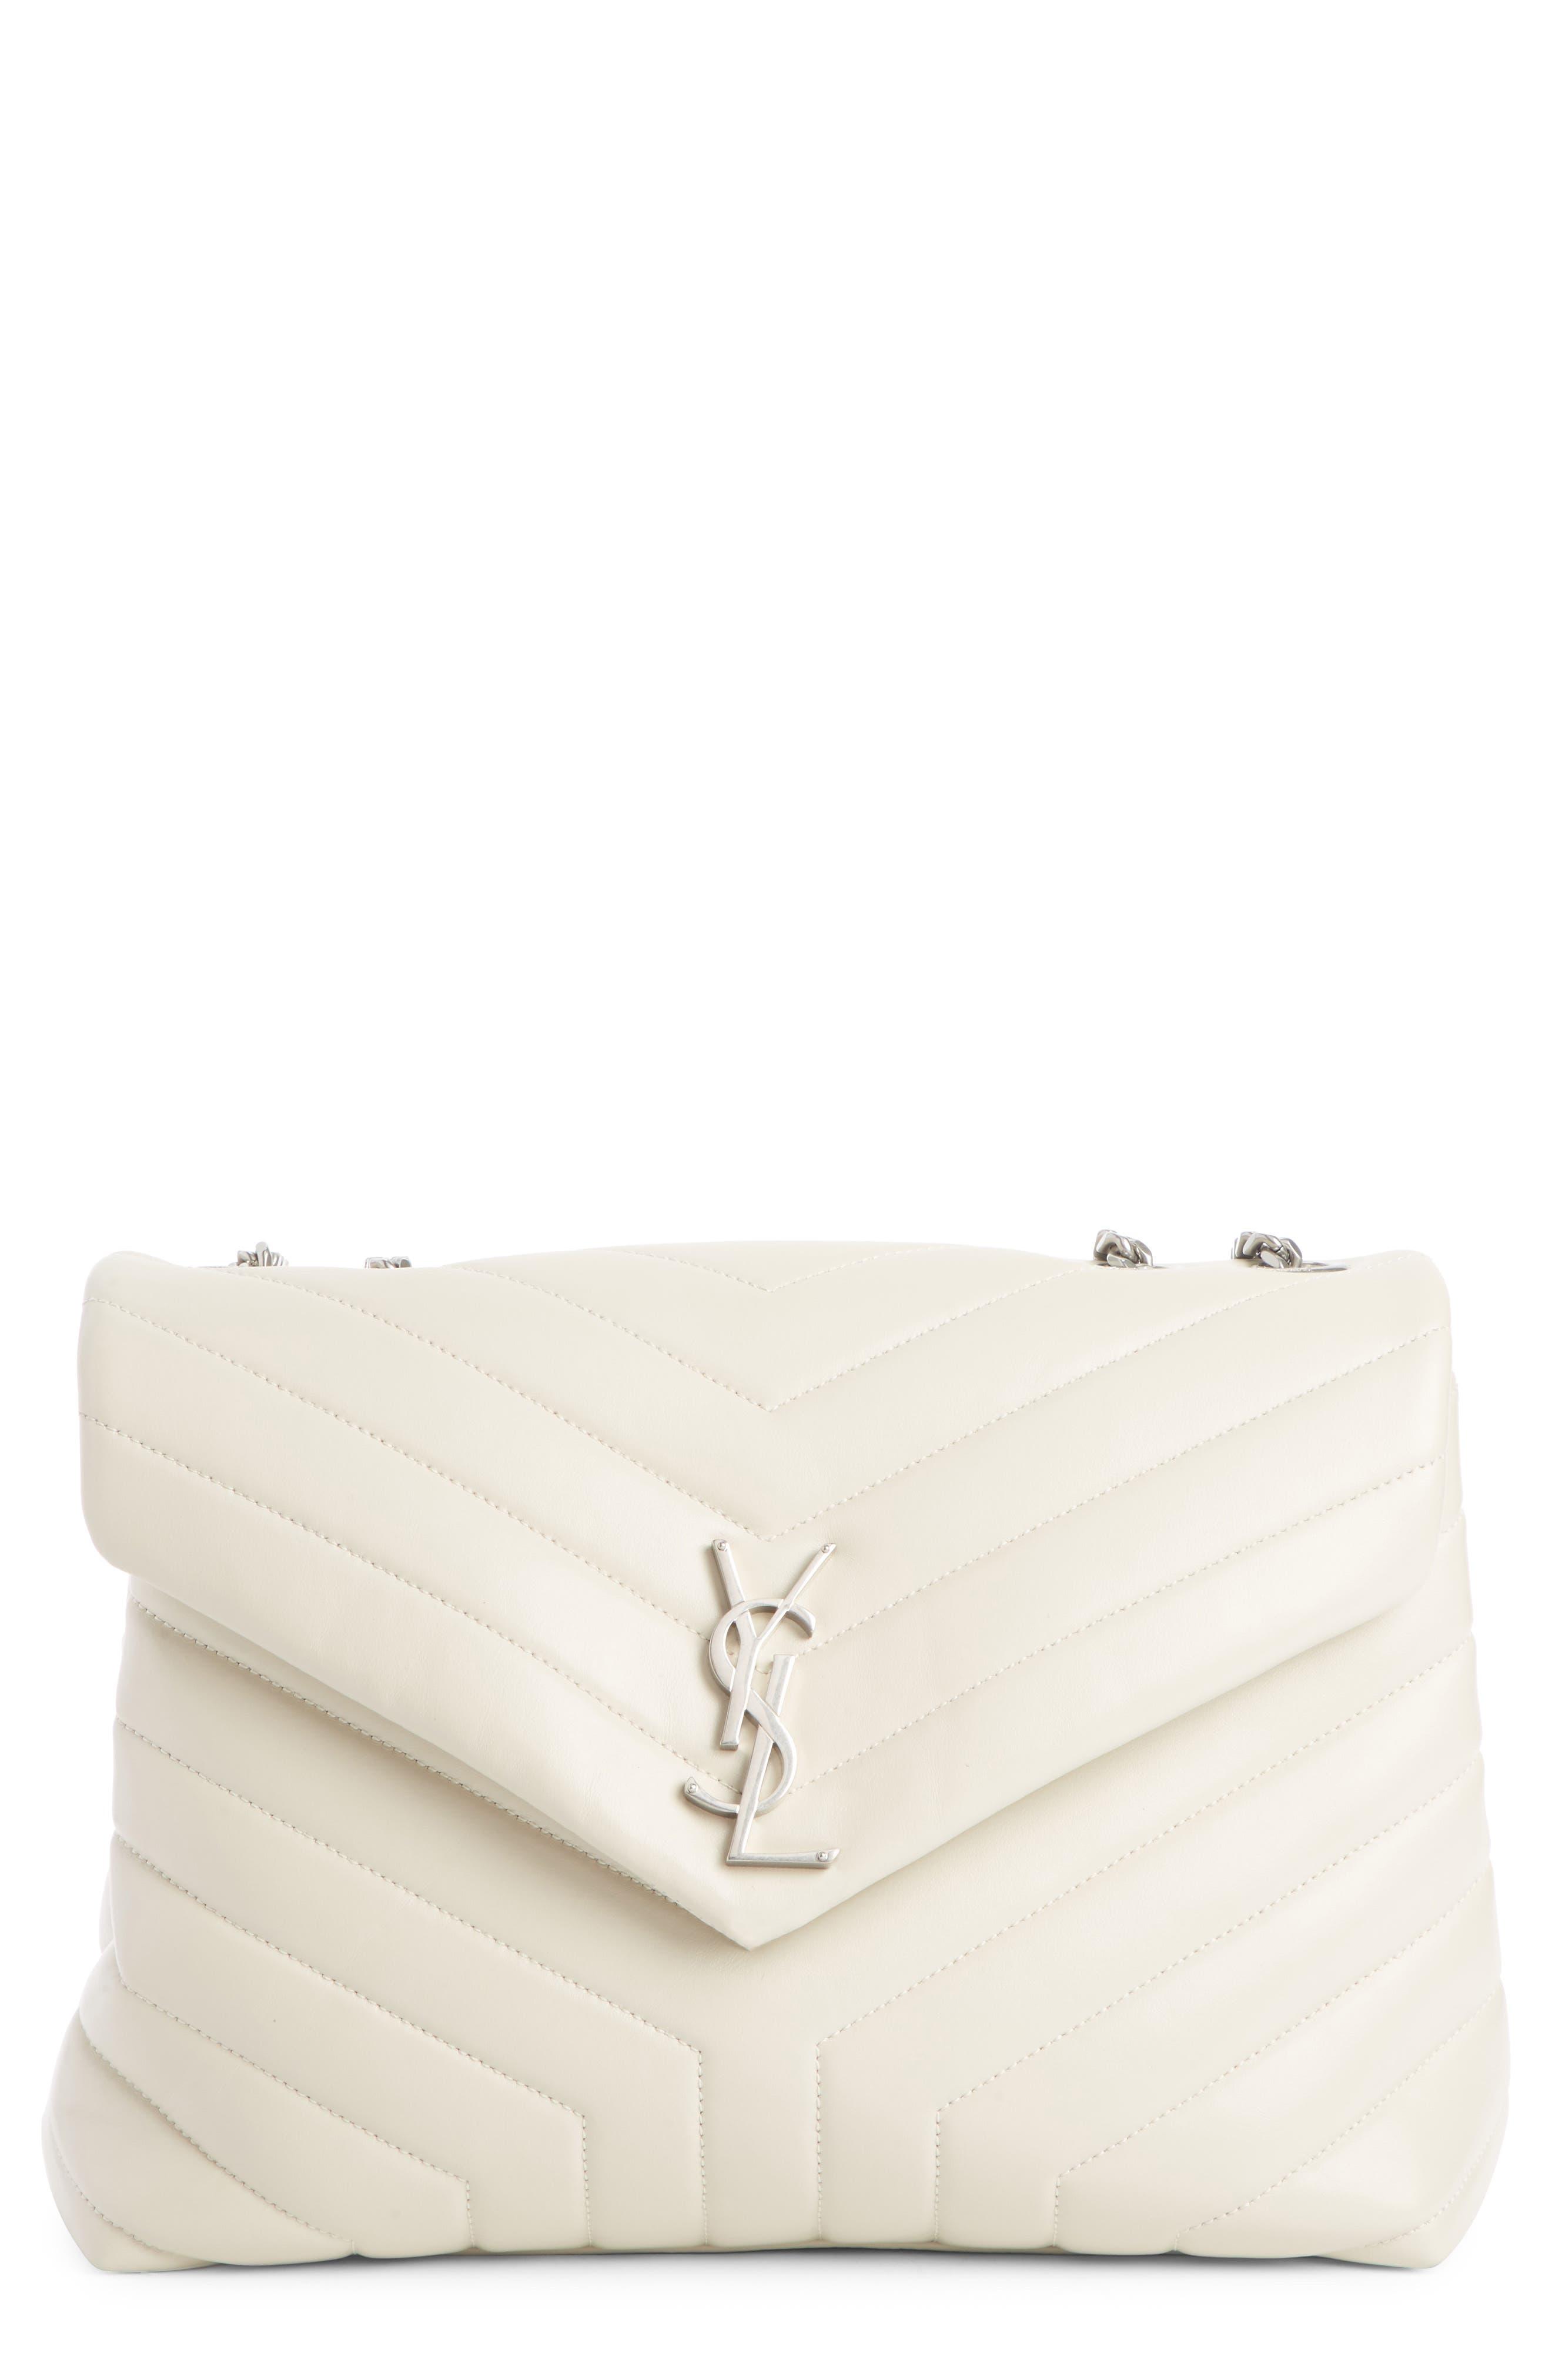 d477c21ee1b Saint Laurent Loulou Monogram Ysl Medium Chain Shoulder Bag In Crema Soft  Crema  Soft